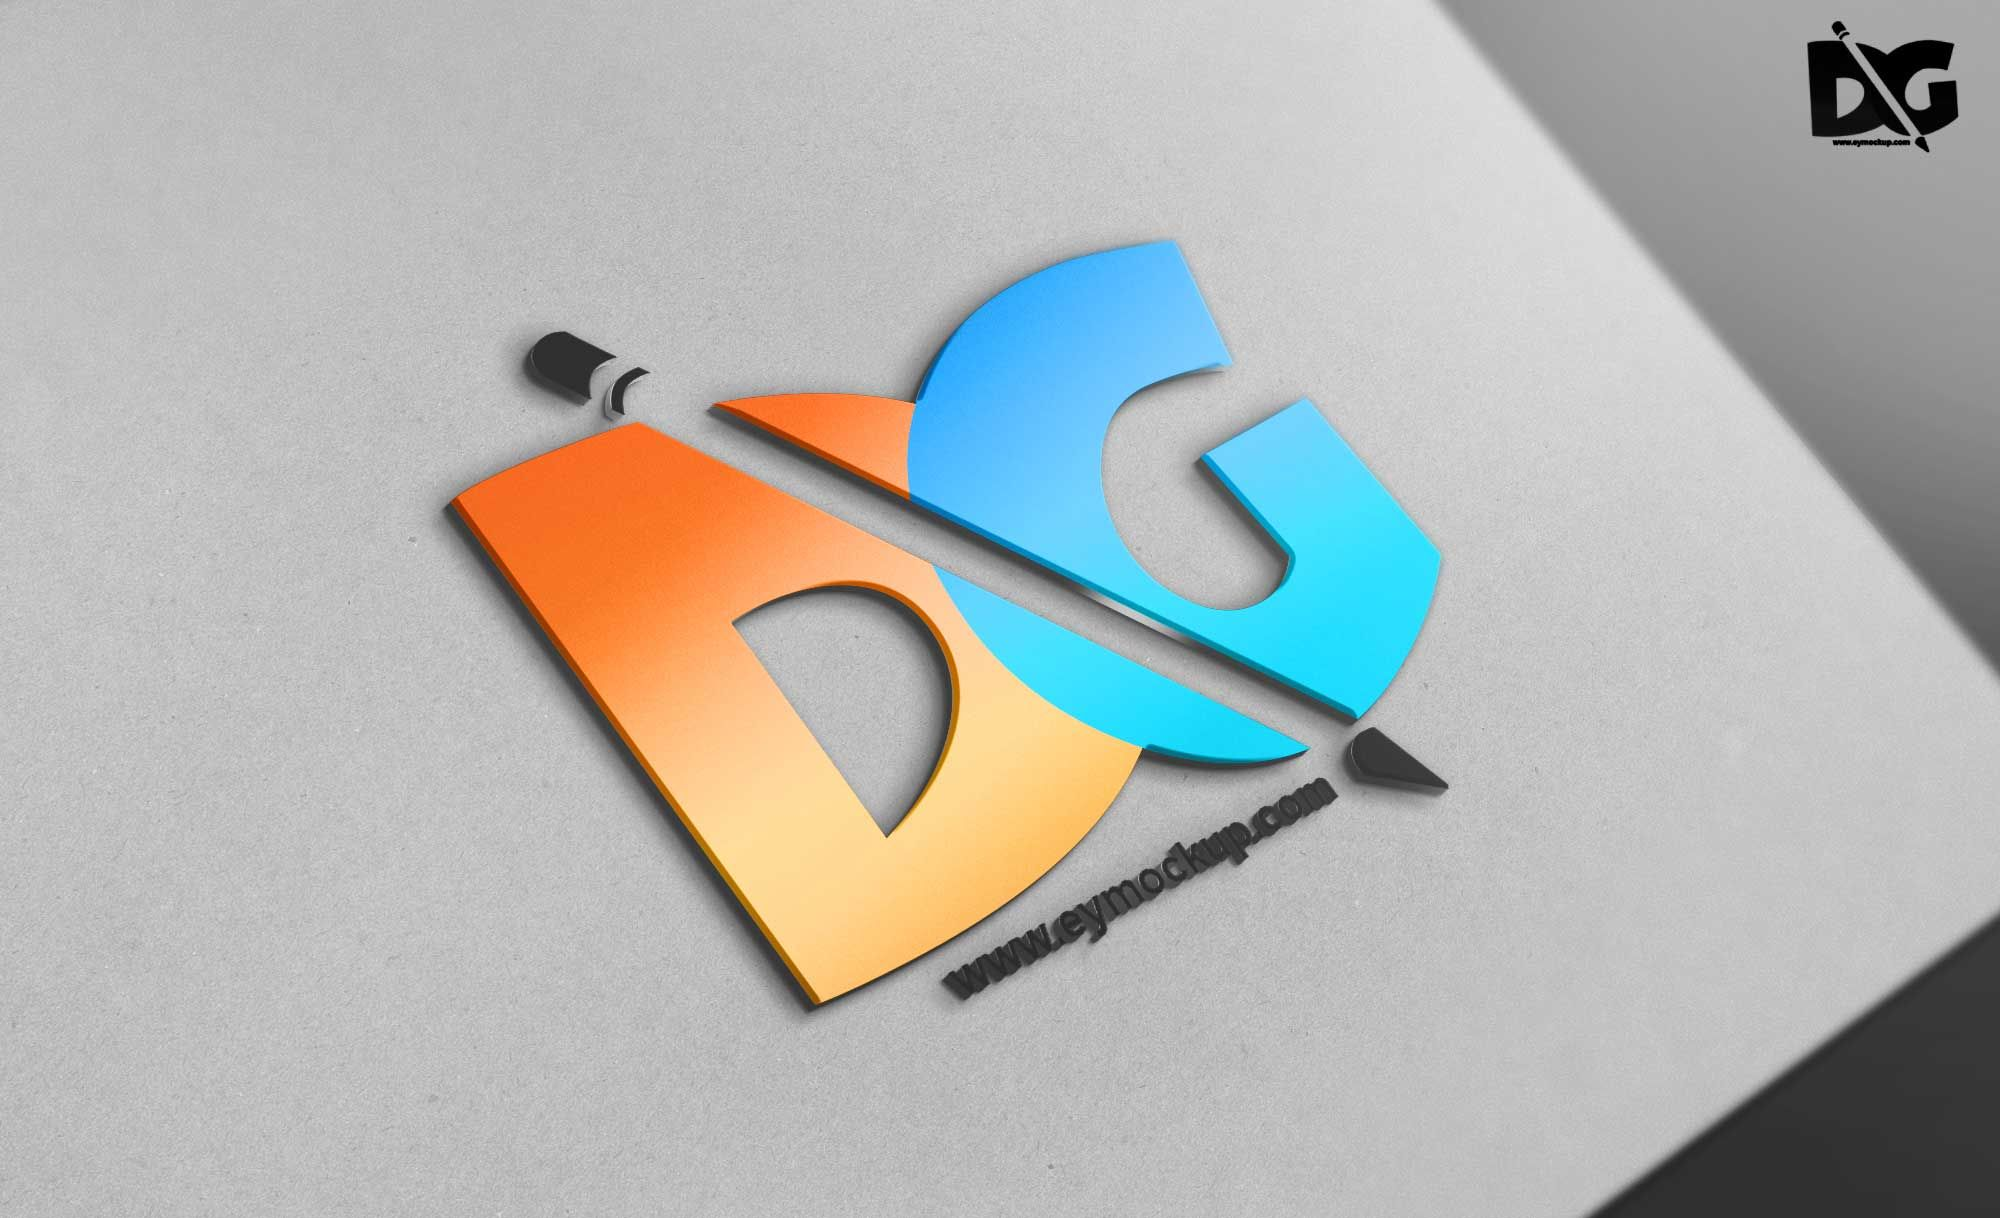 Tilt 3d Logo Mockup Psd Free Psd Mockup New Mockup Free Logo Mockup Psd Free Logo Templates Psd Design Mockup Free